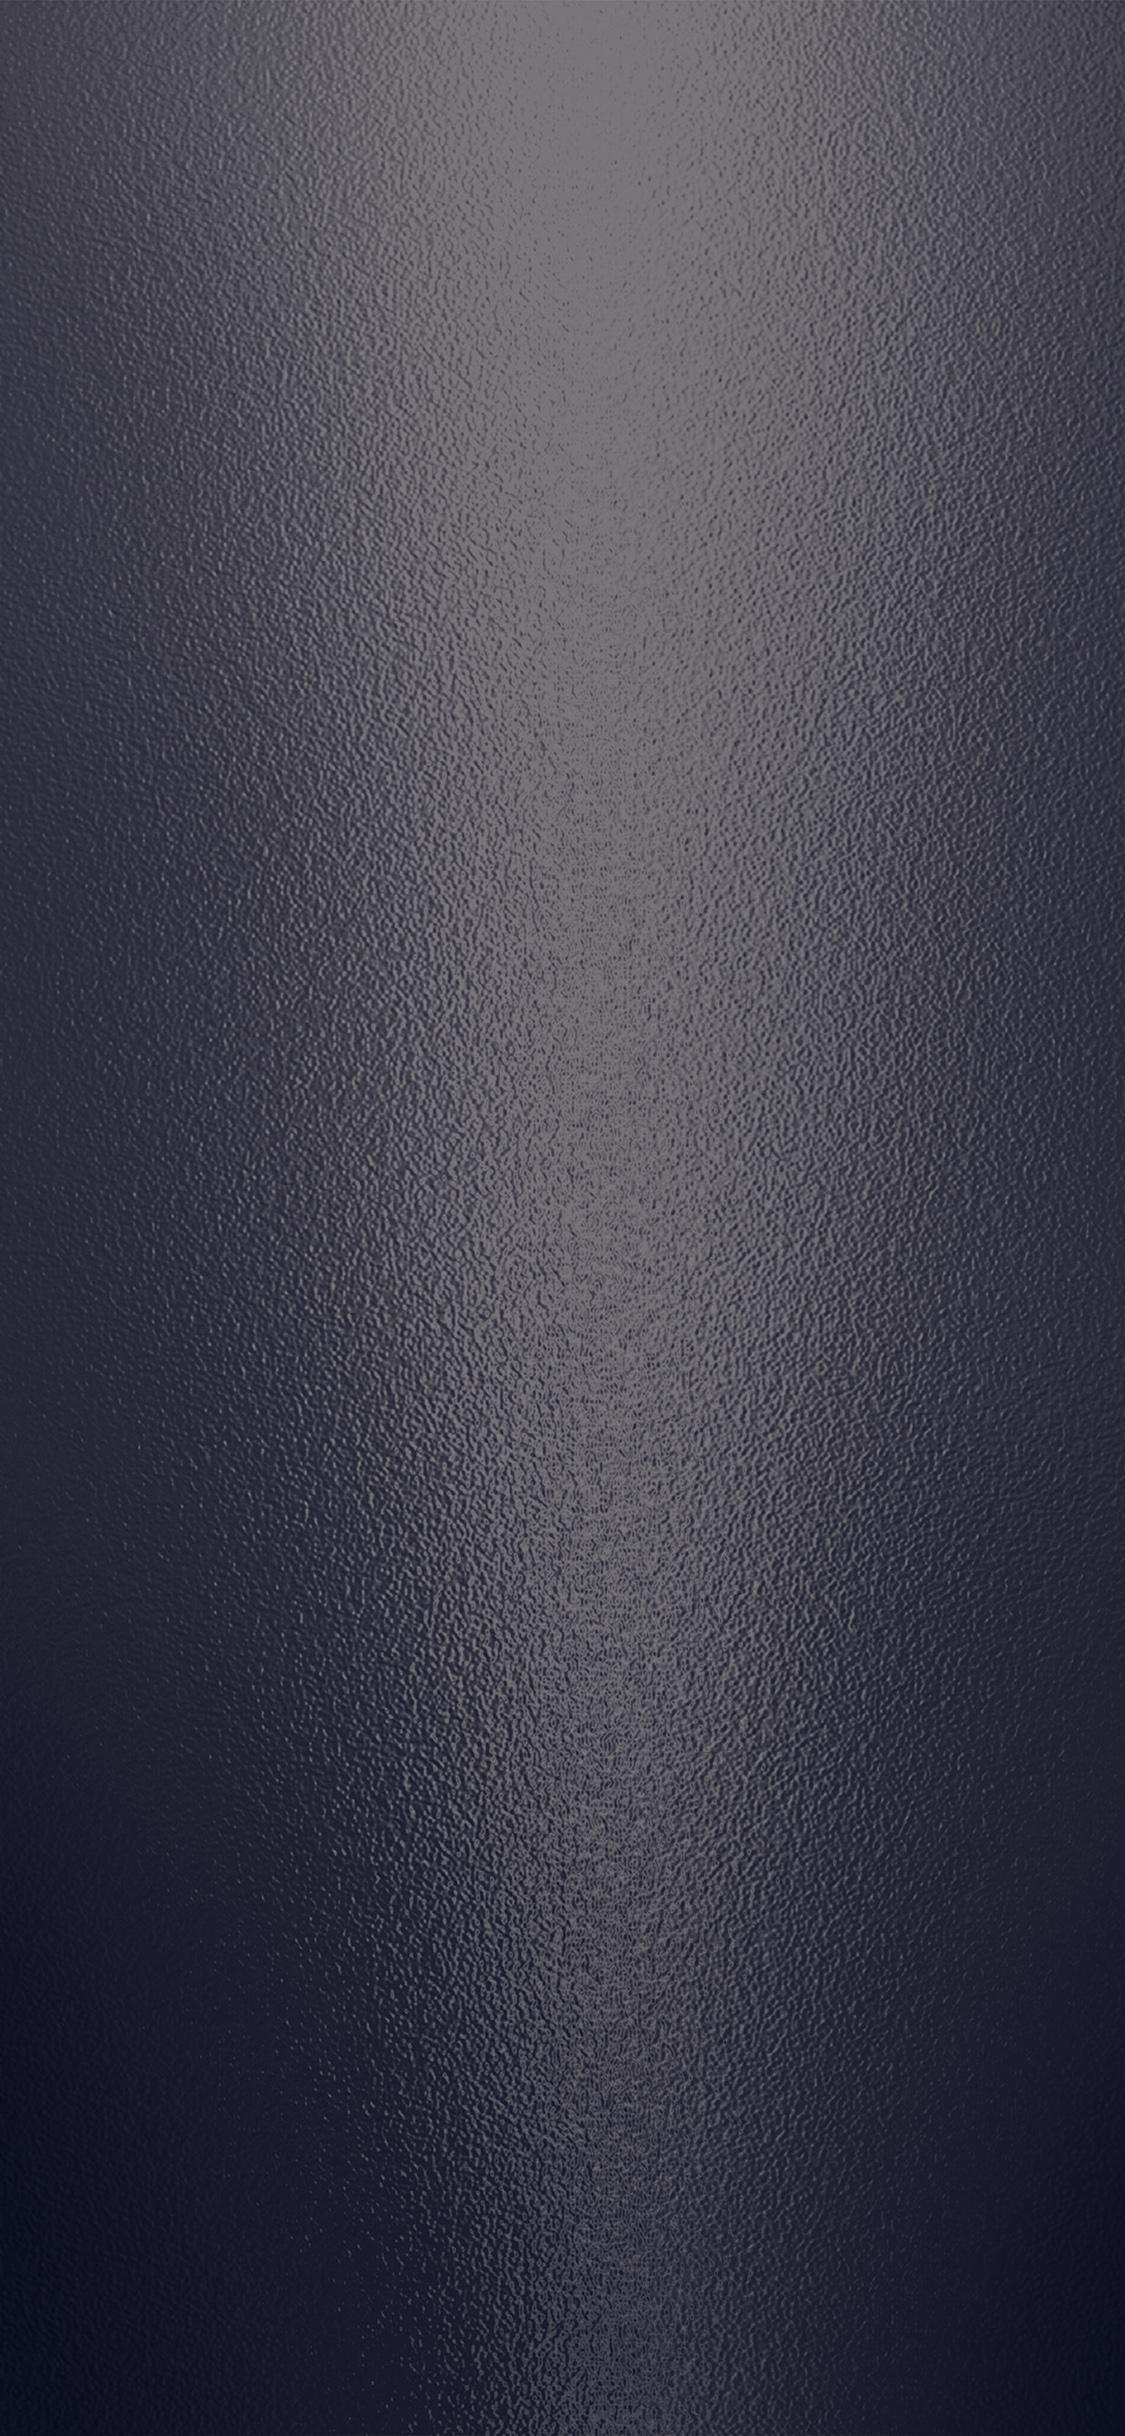 iPhonexpapers.com-Apple-iPhone-wallpaper-vr47-texture-dark-blue-metal-pattern